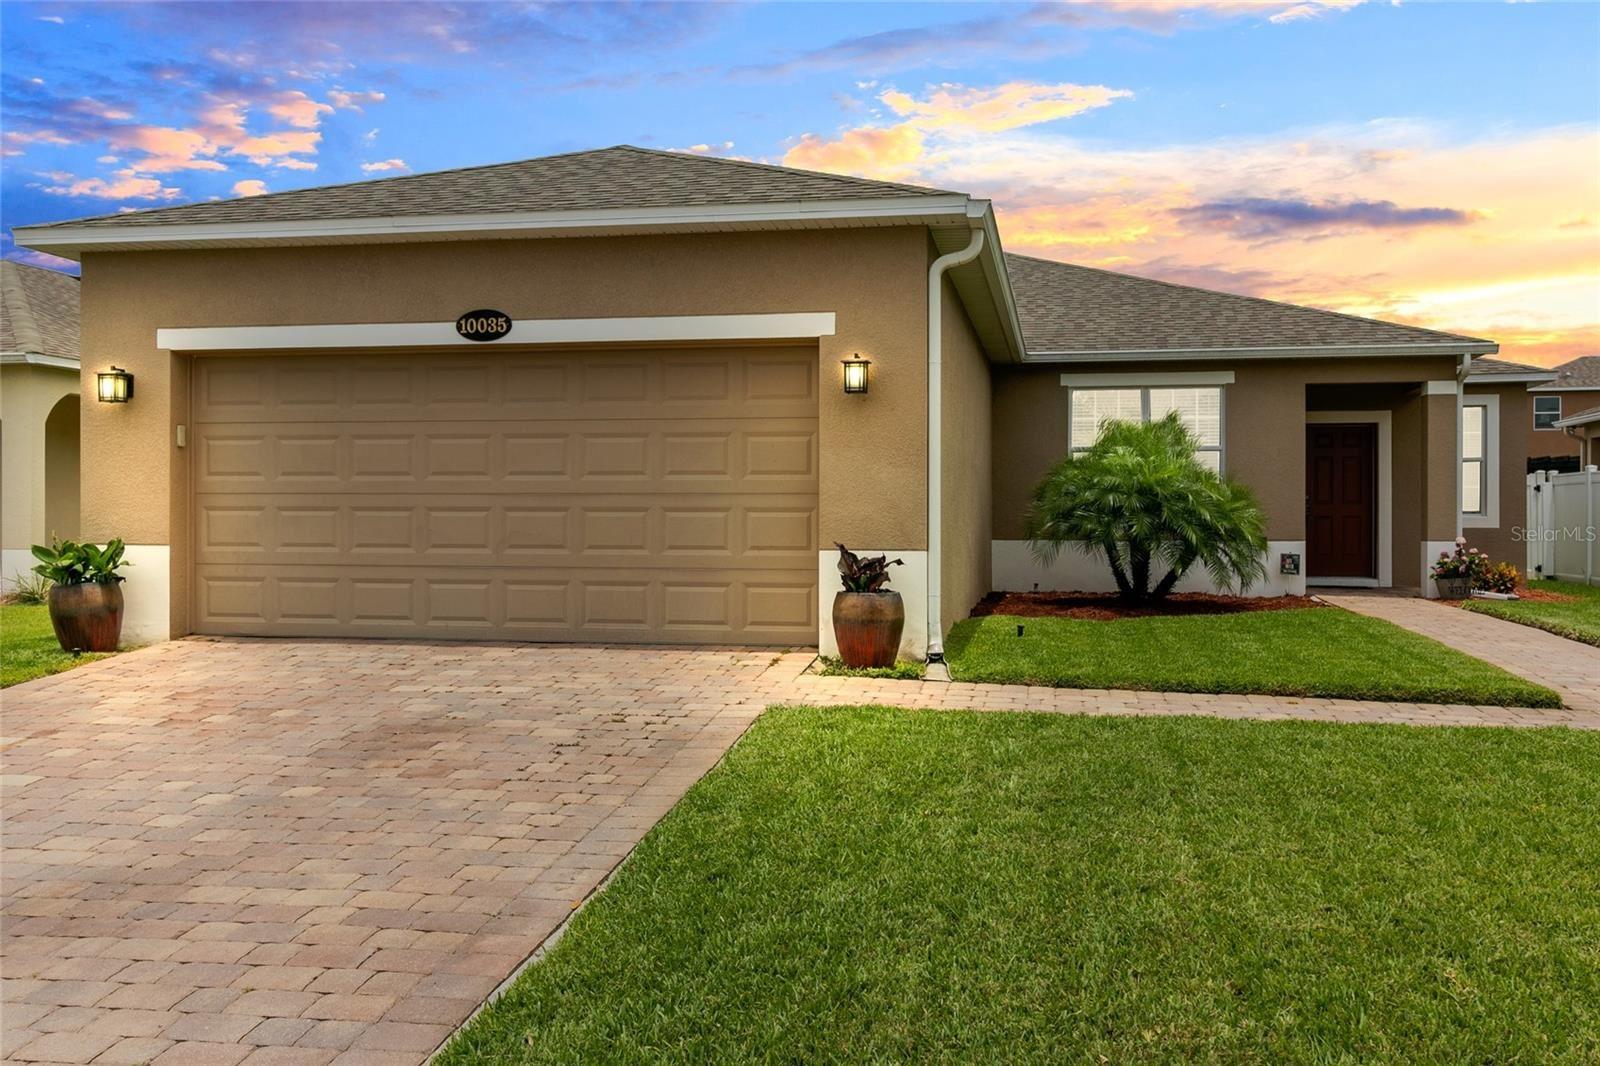 10035 PENTRIDGE ROAD, Orlando, FL 32829 - #: O5951302